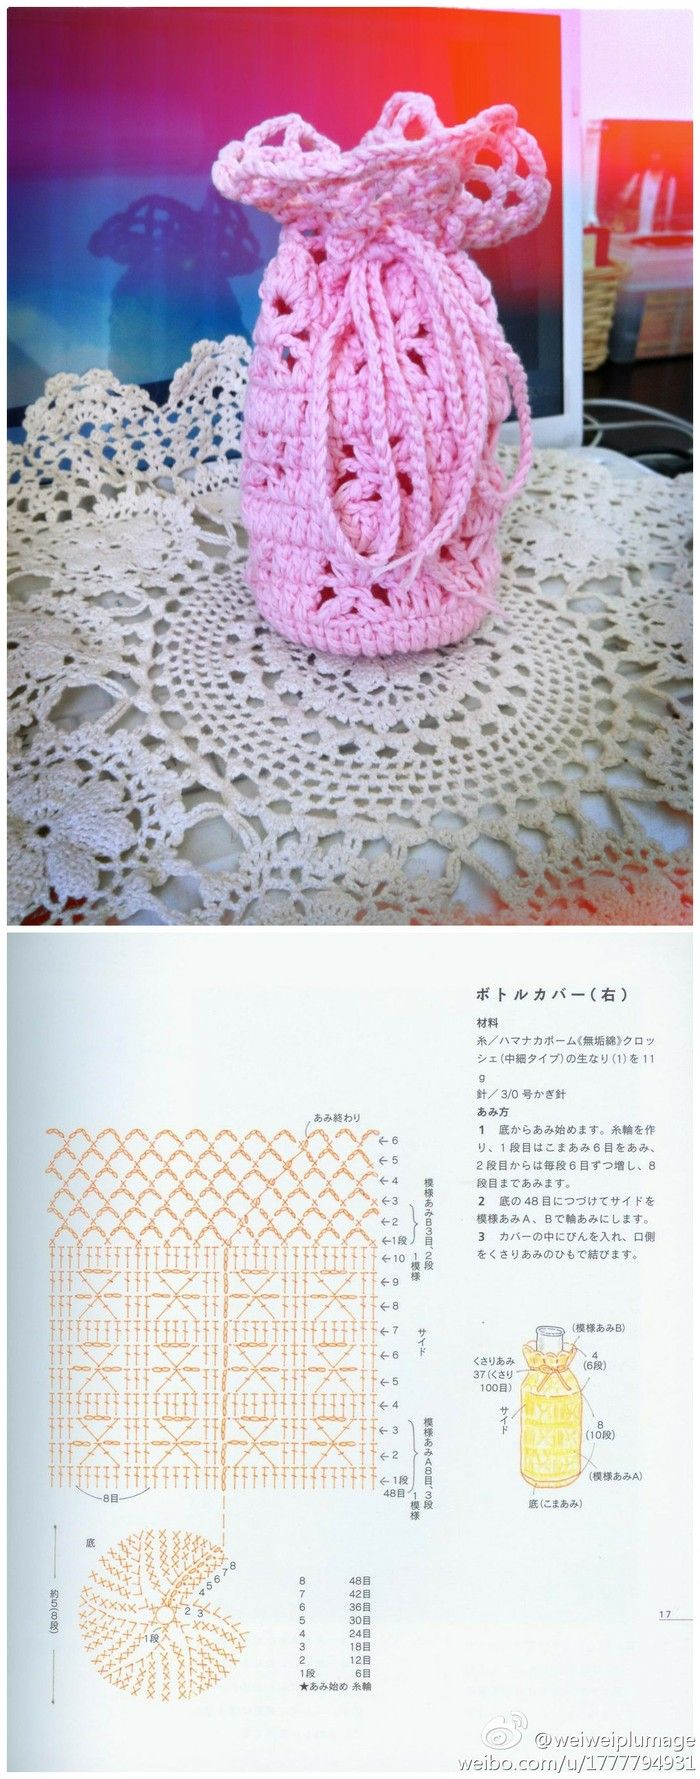 Mejores 301 imágenes de crochet en Pinterest   Patrones de ganchillo ...